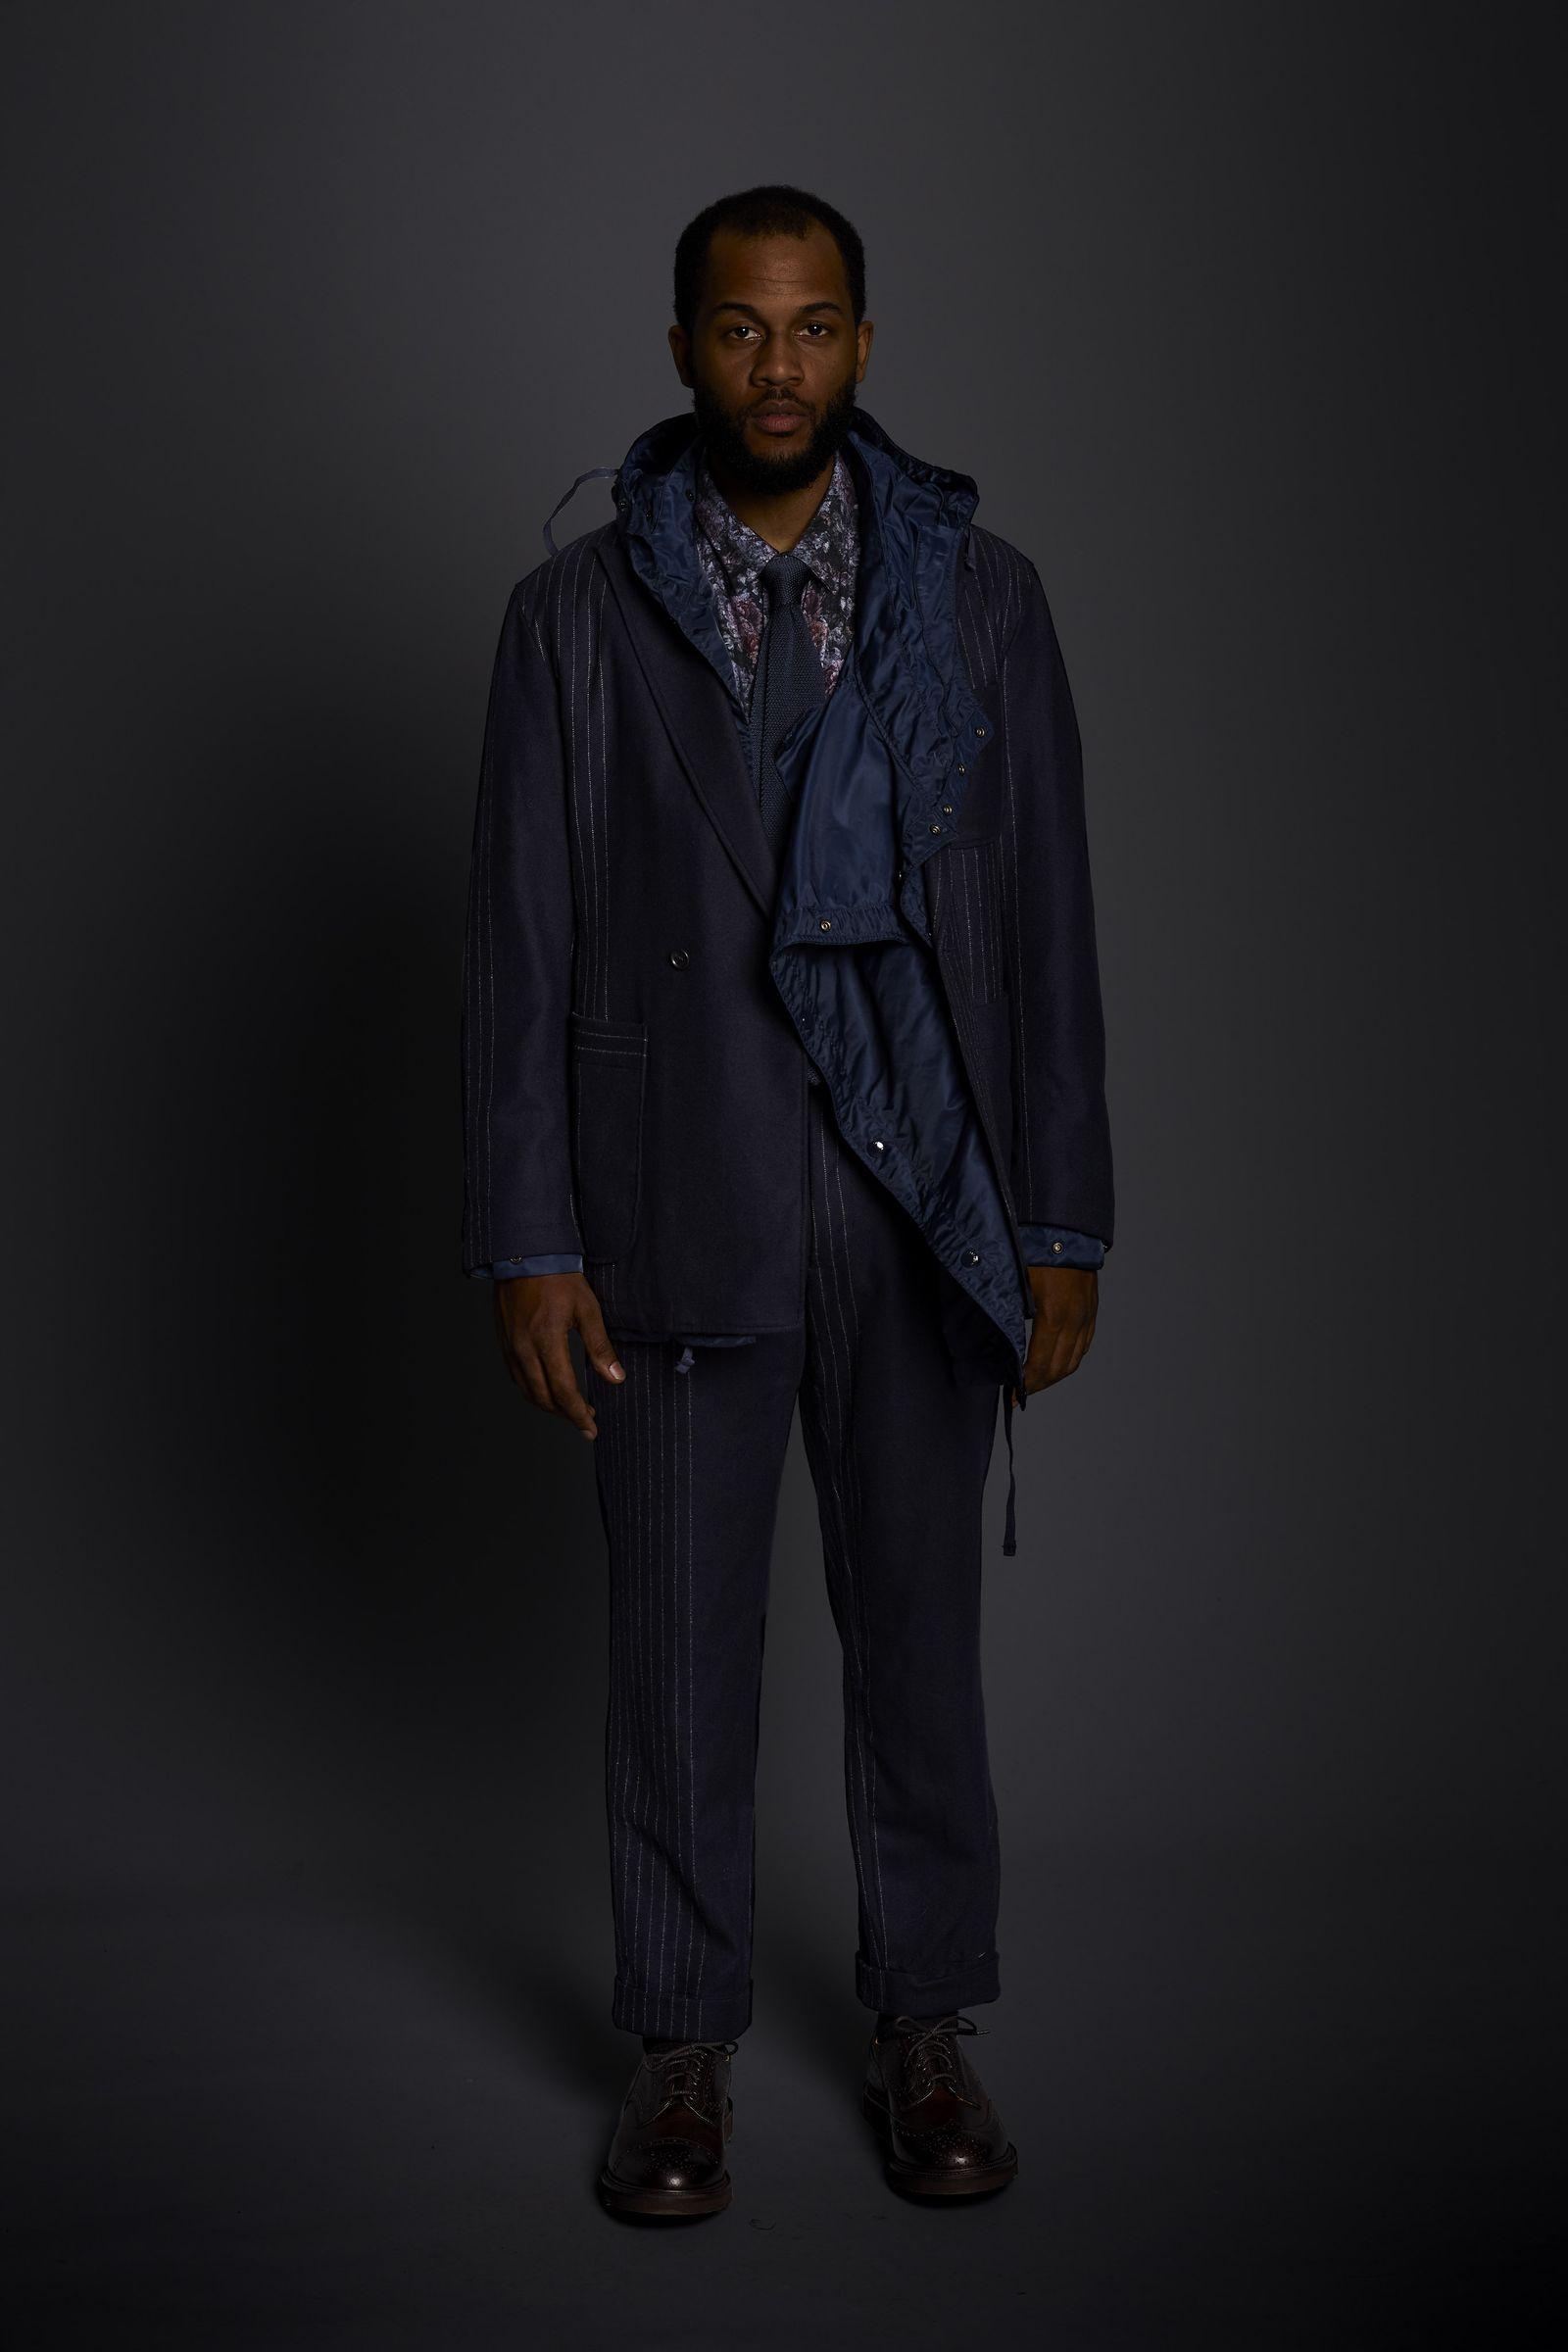 engineered-garments-fall-winter-2020-14